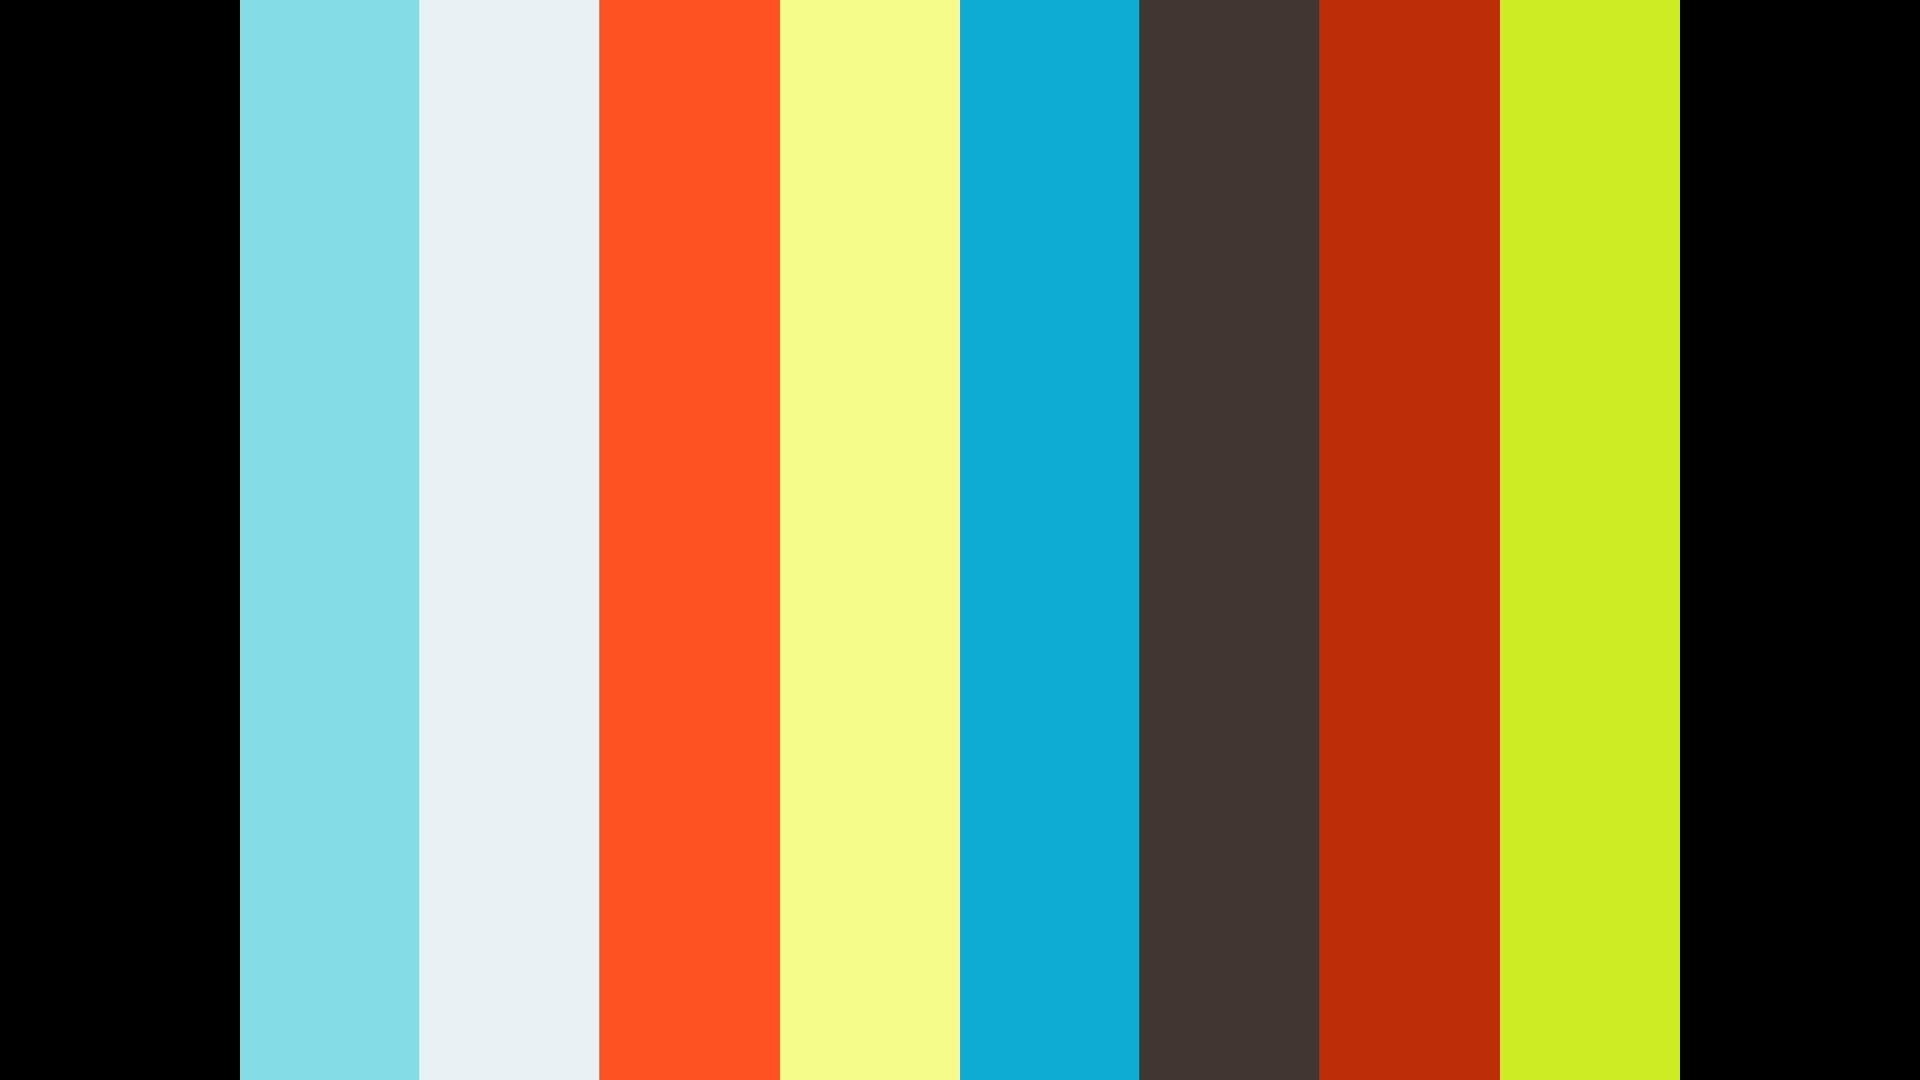 [ACE+] 창조융합원 미디어 컴퓨터 연계전공